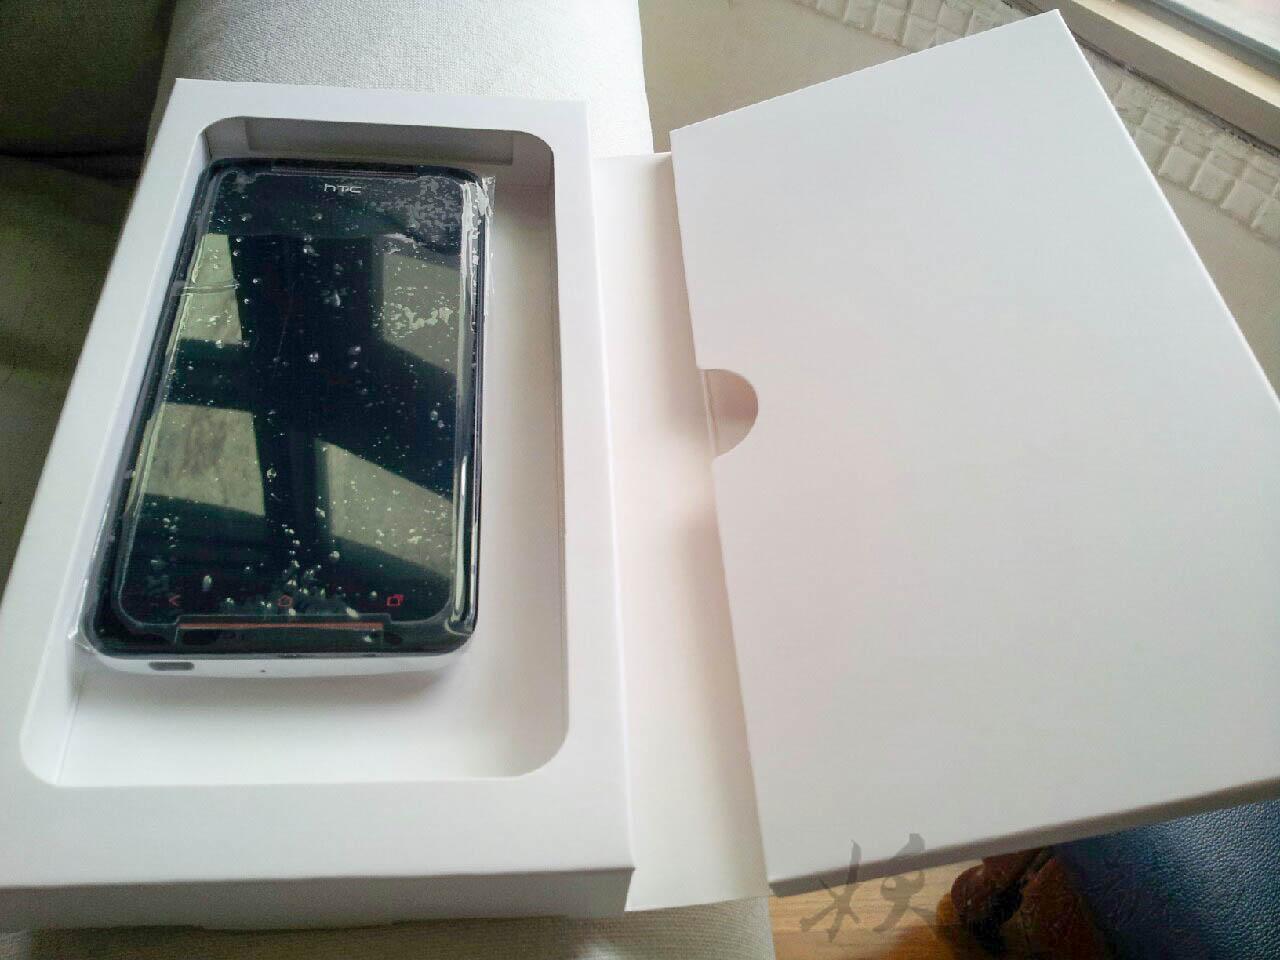 20150806 4681 - HTC Butterfly S 相機紫光 - 過保維修記(已s-off + Unlocked)